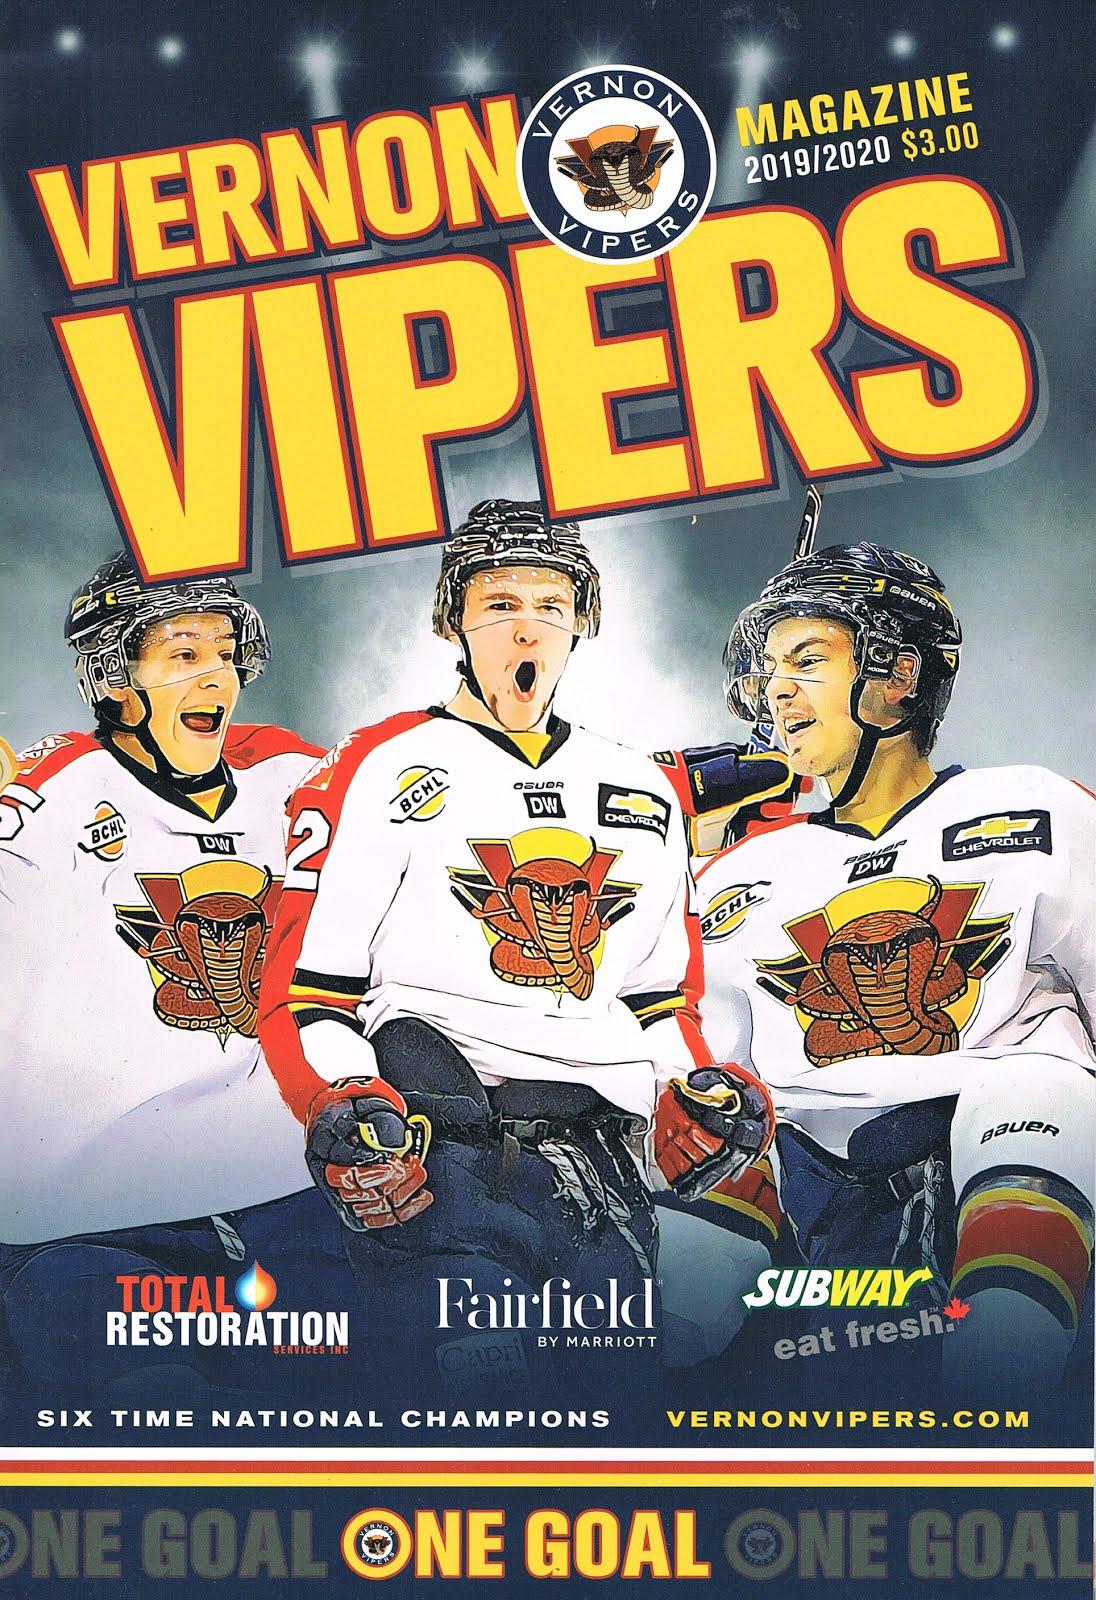 Vernon Vipers 2019-20 Program